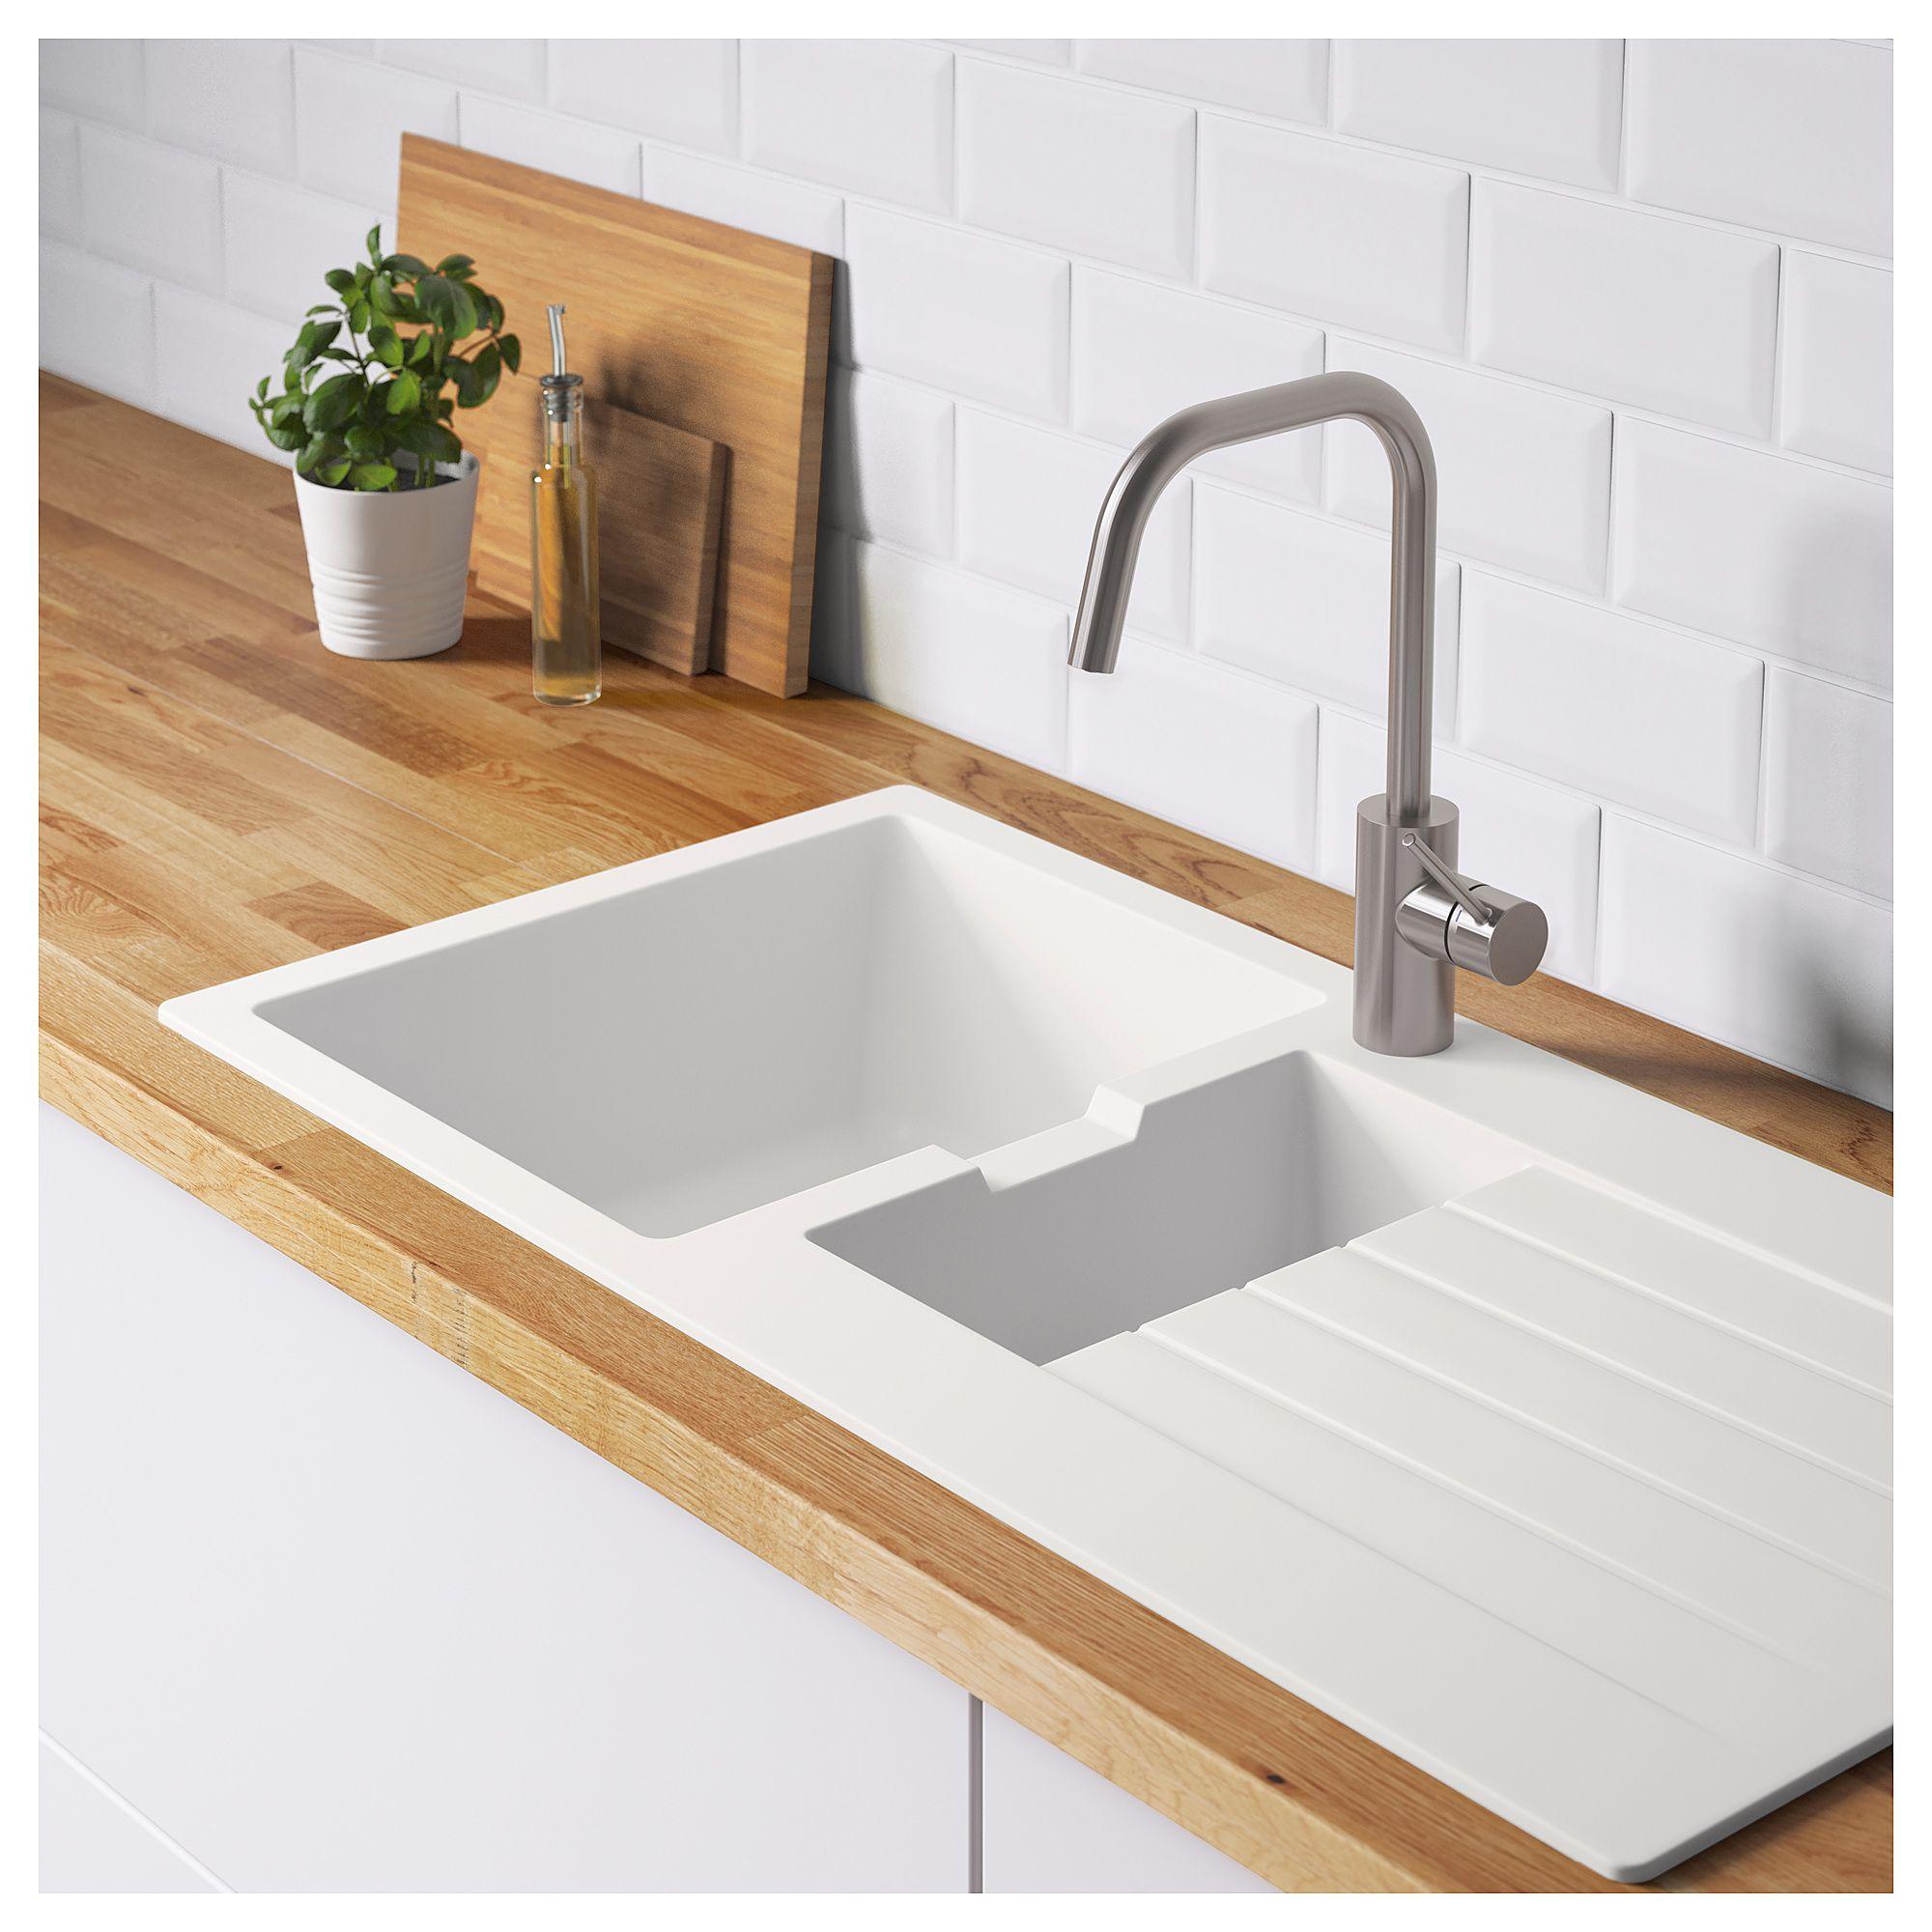 Mobilier Et Decoration Interieur Et Exterieur Inset Sink Ceramic Kitchen Sinks Stainless Steel Kitchen Sink